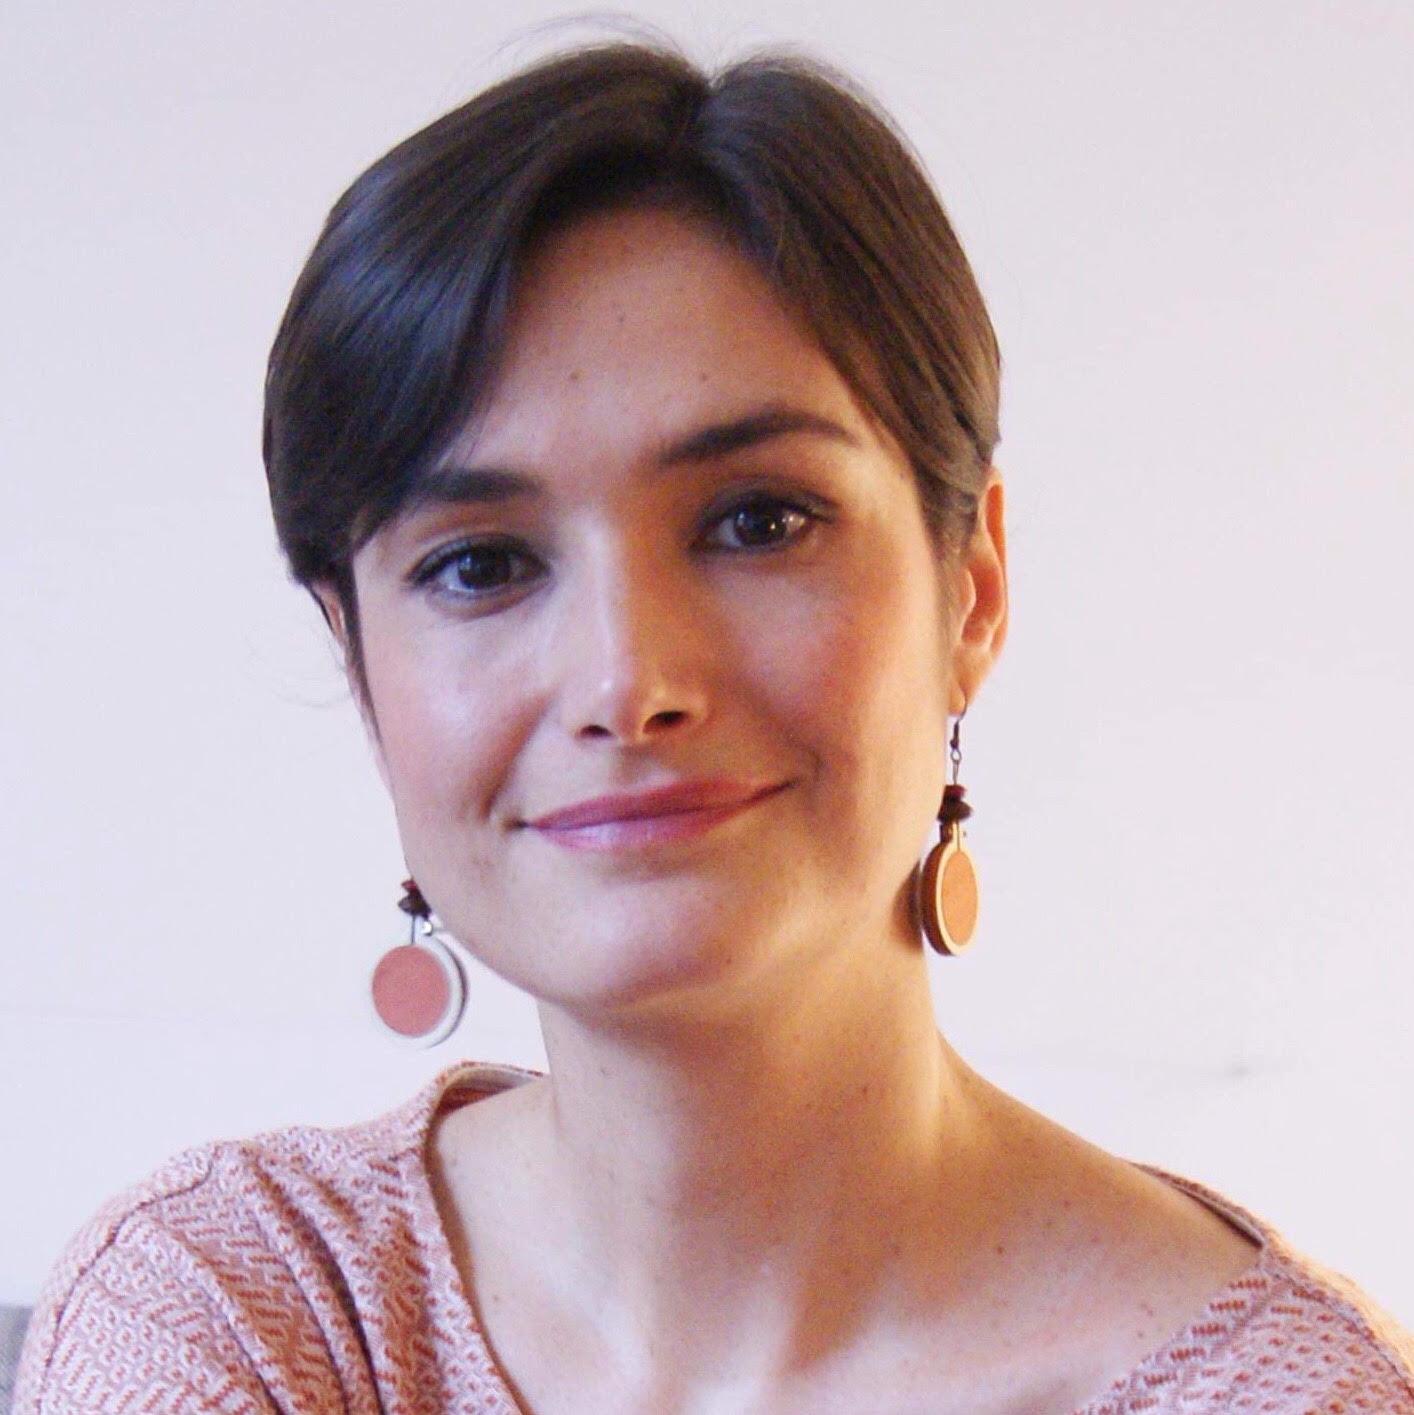 Cécile Leroy